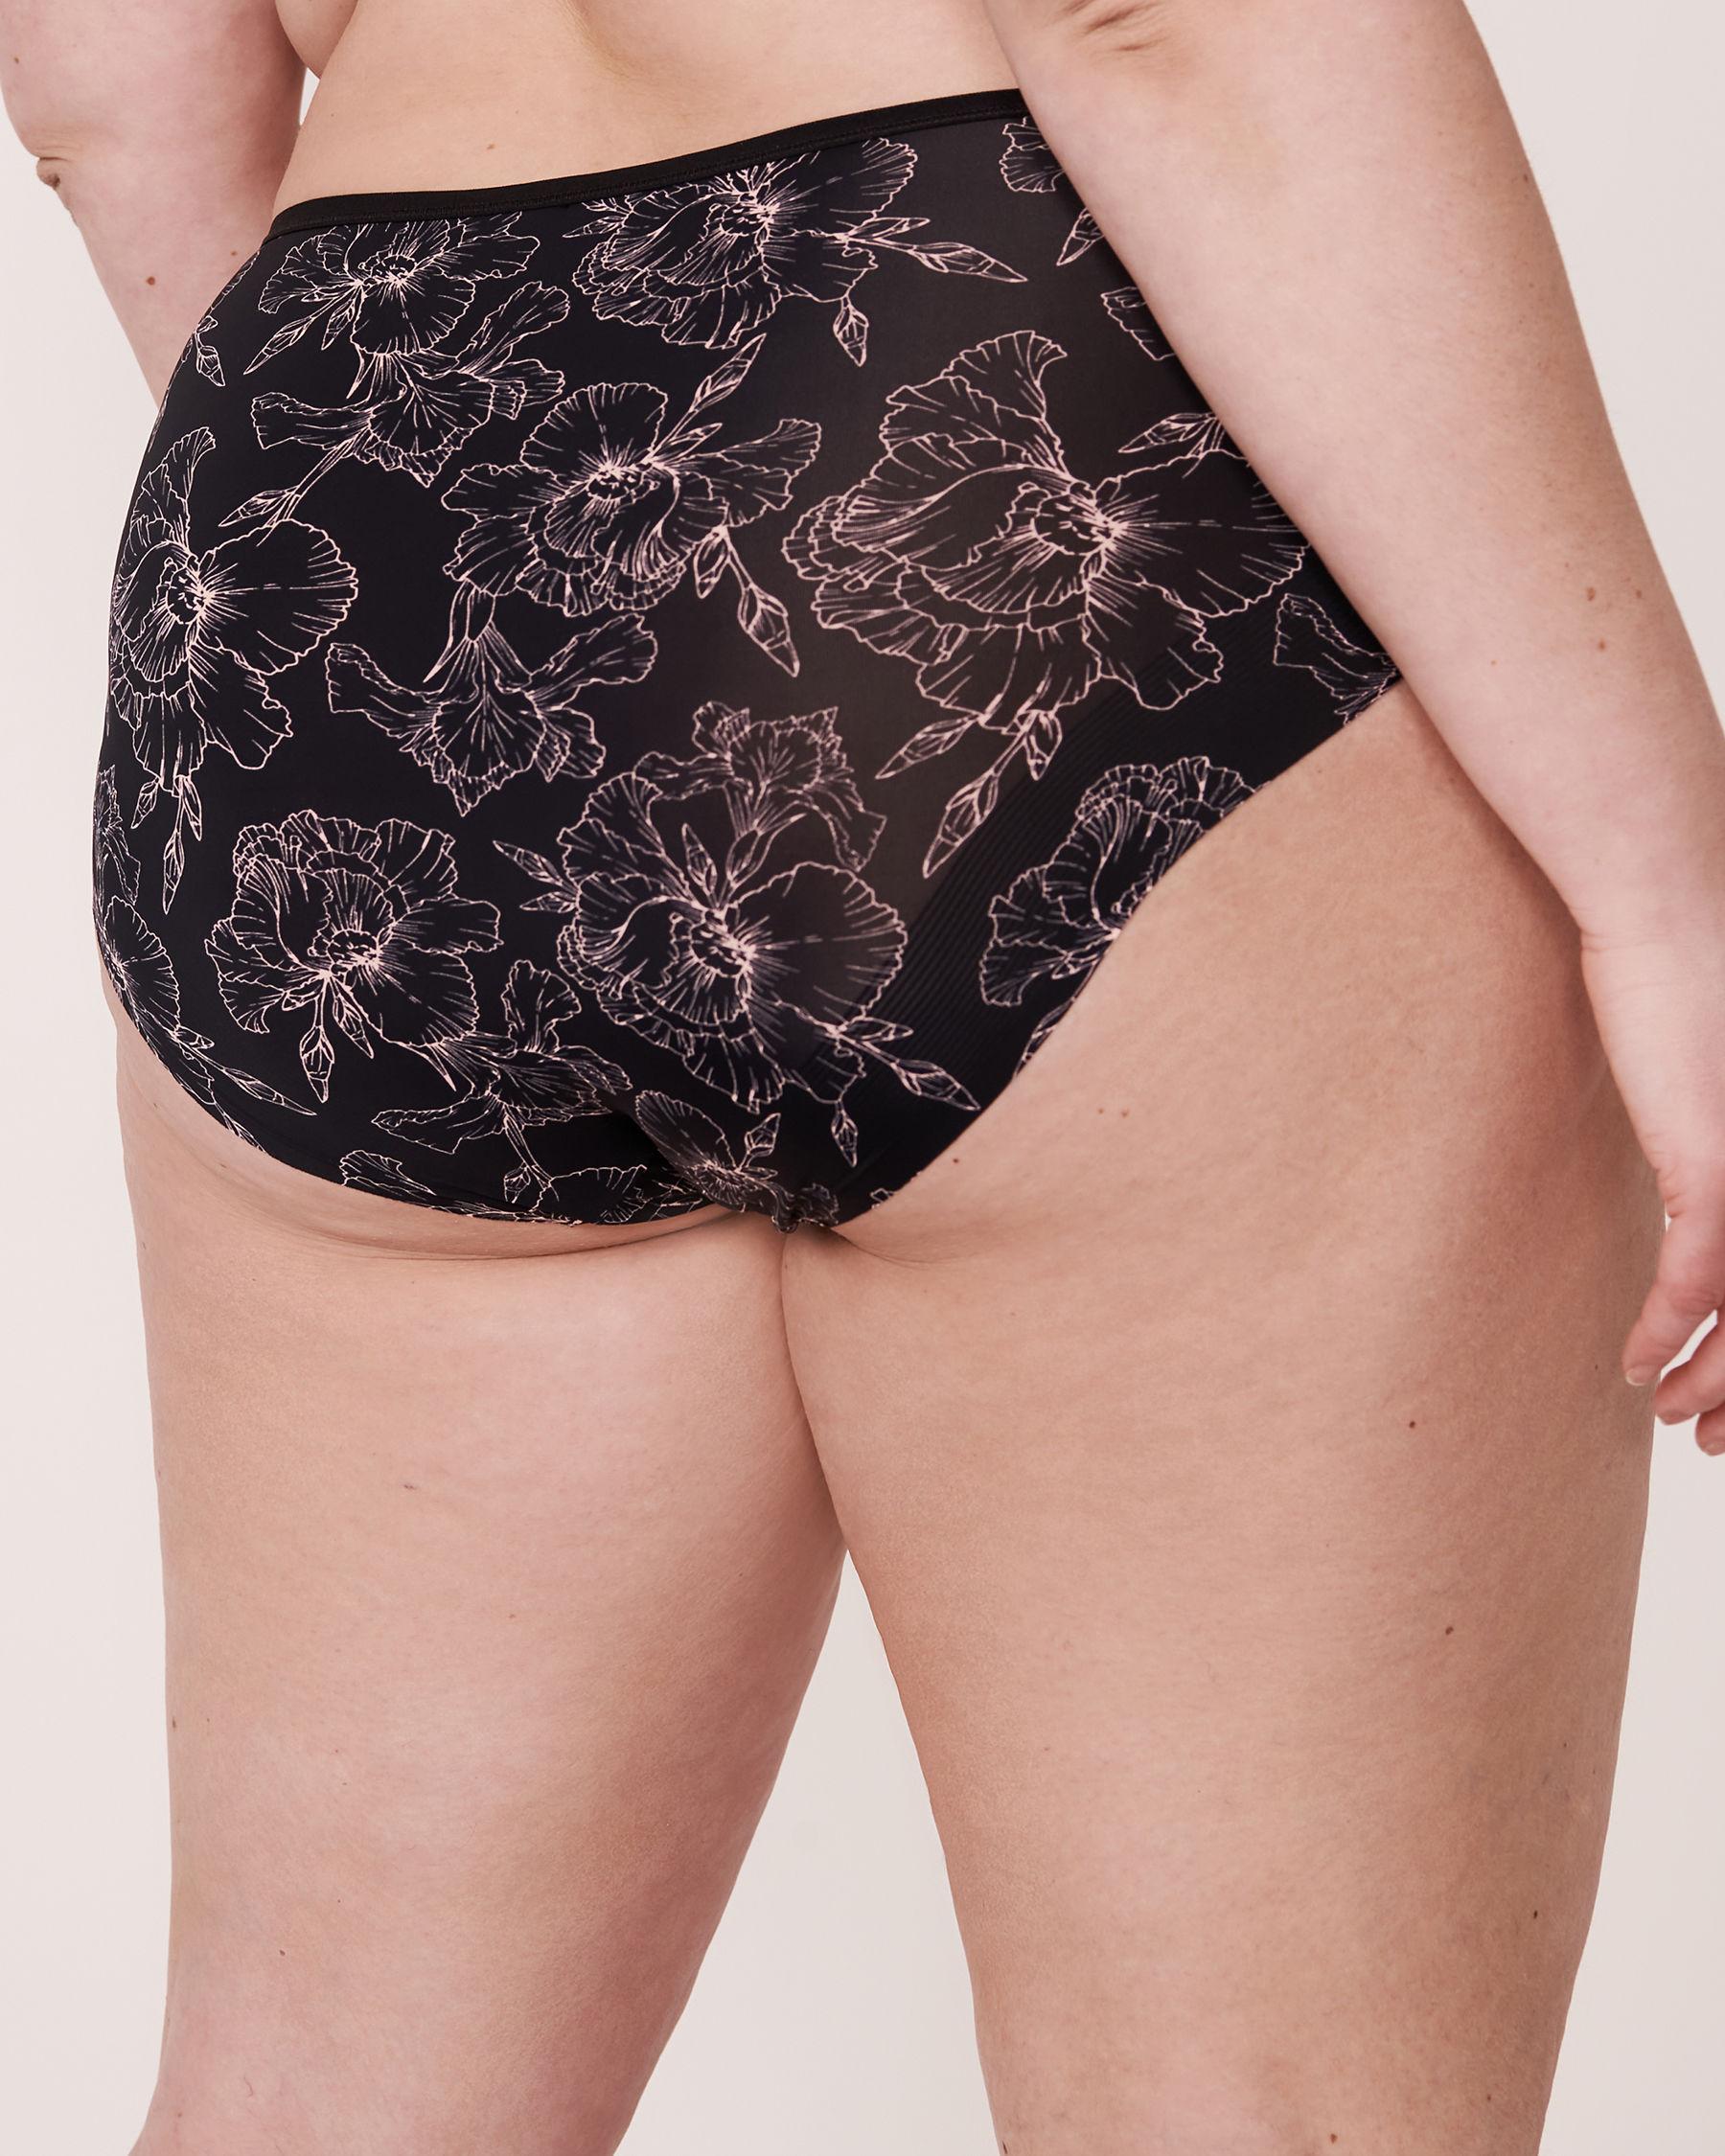 LA VIE EN ROSE Recycled Fibers High Waist Bikini Panty Black flower 20300037 - View2